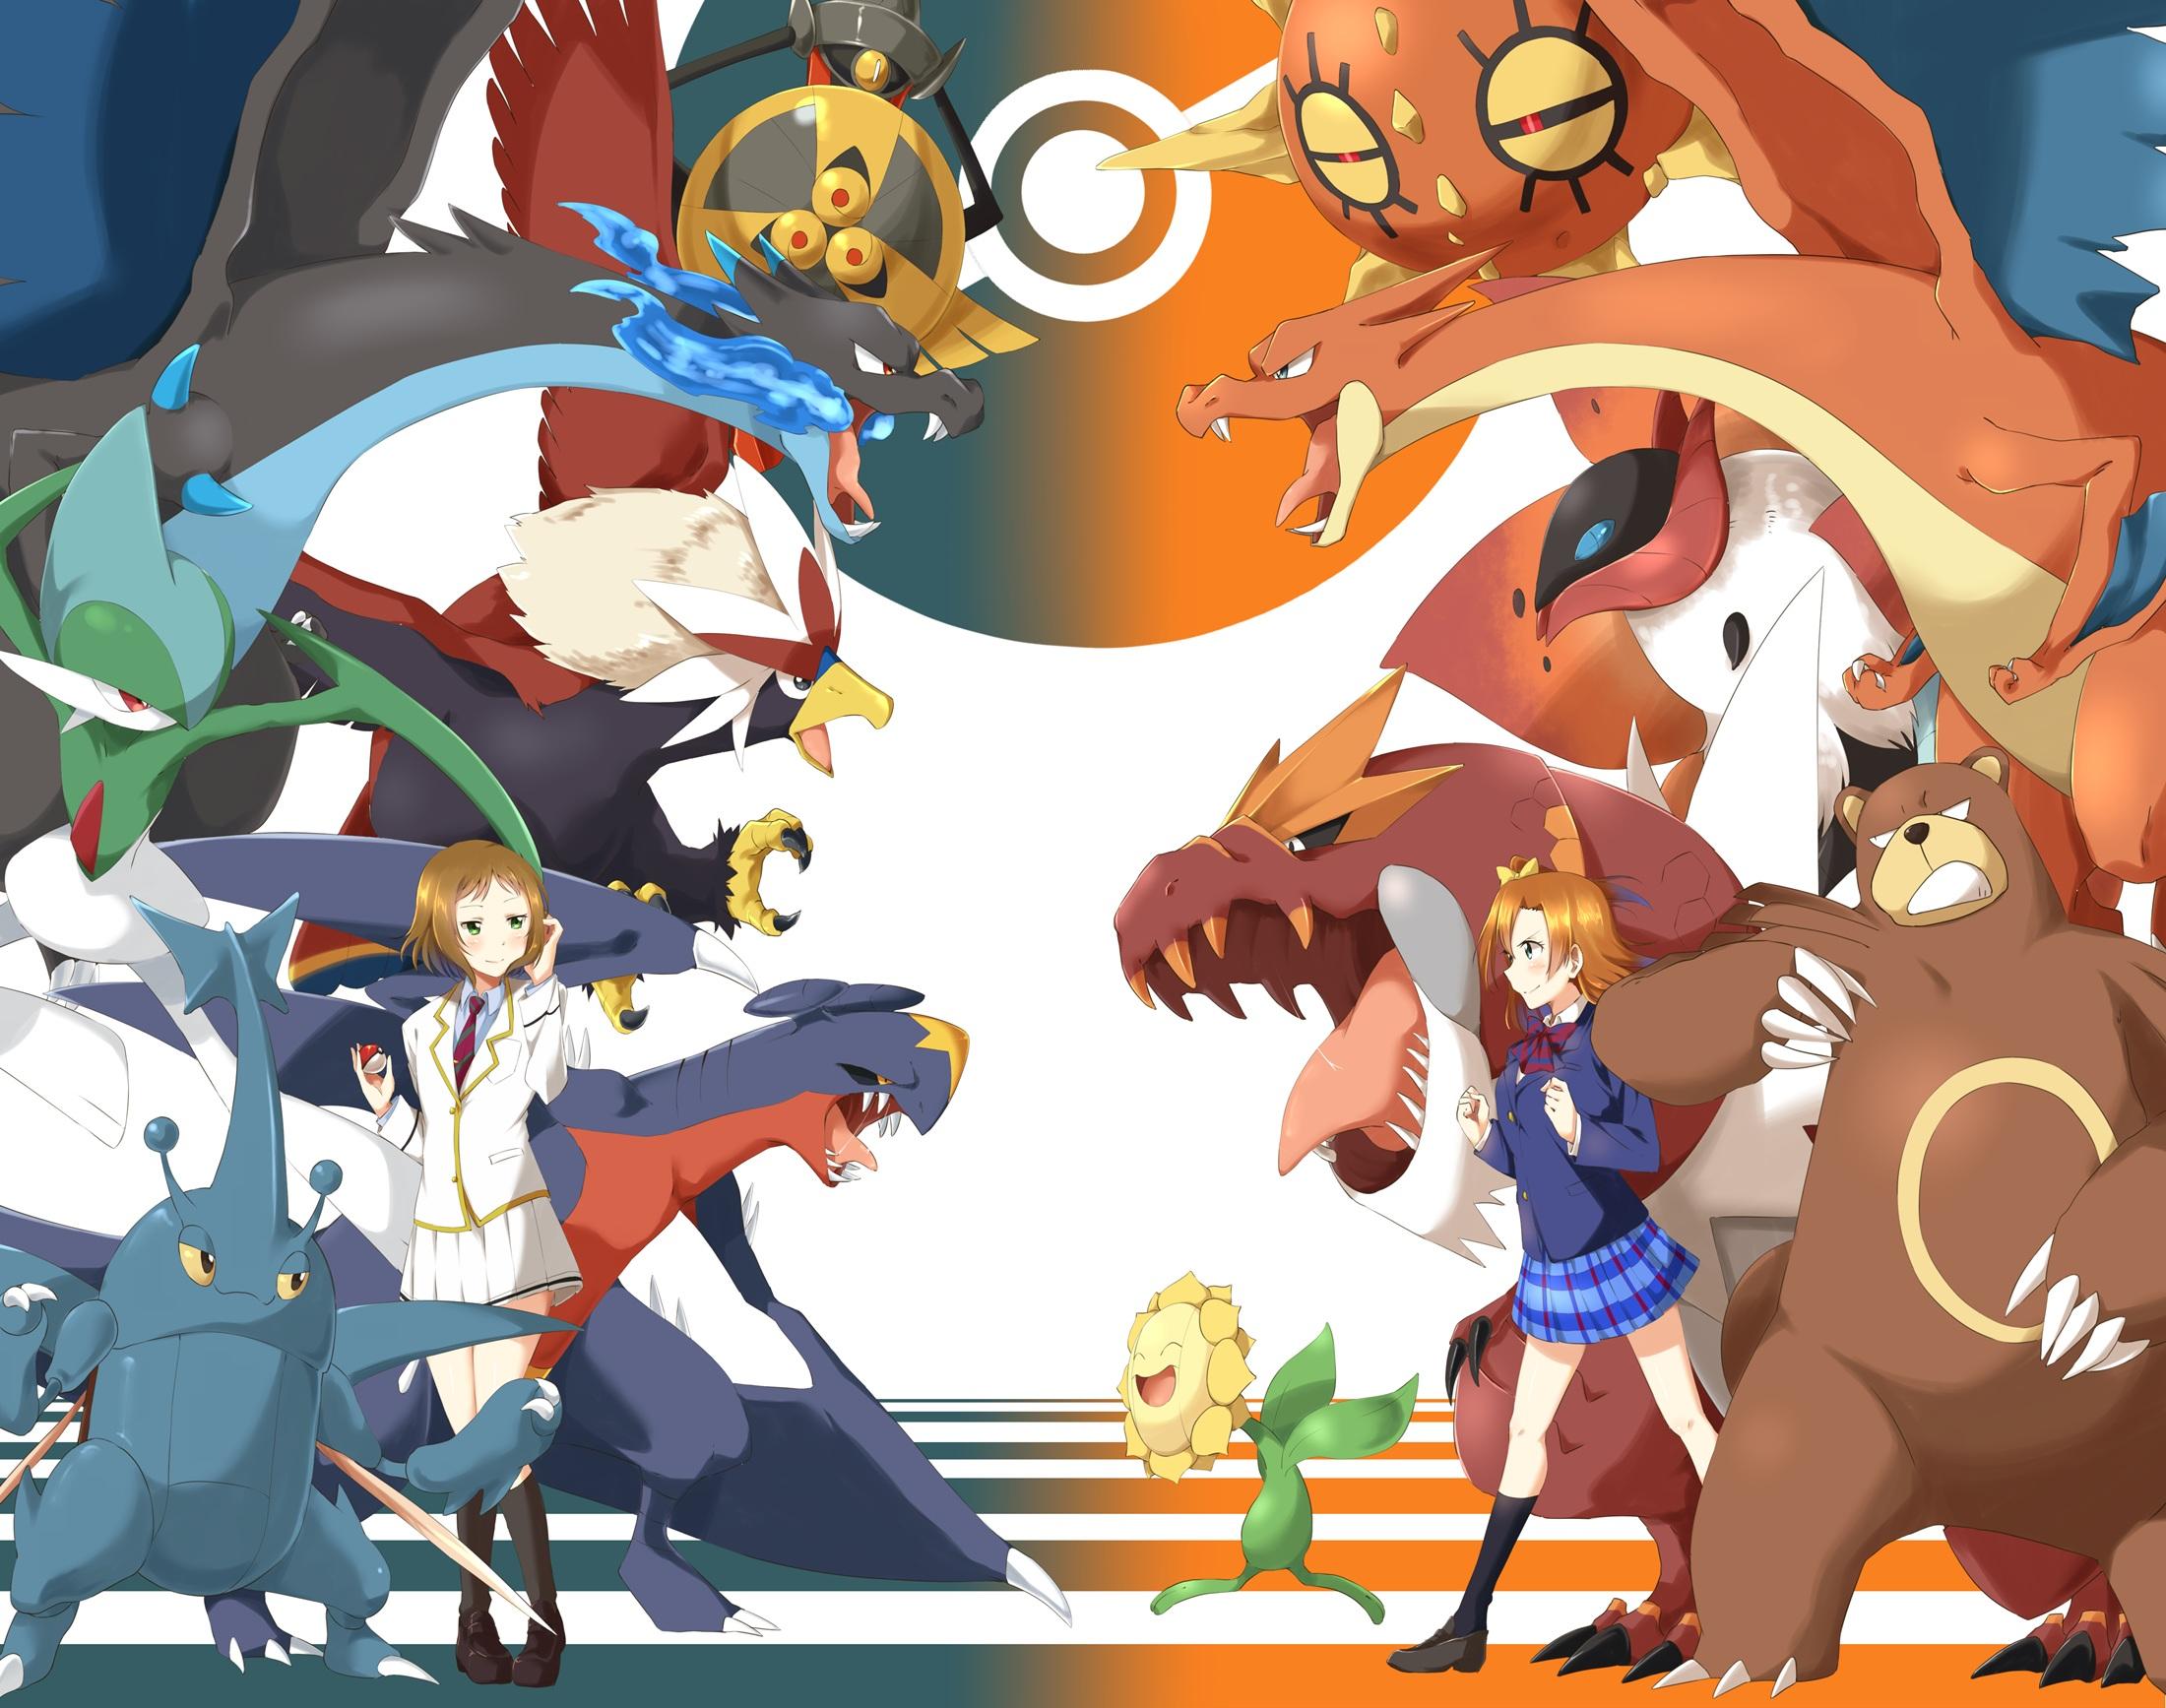 9 Garchomp Pokmon HD Wallpapers Background Images   Wallpaper 2200x1735